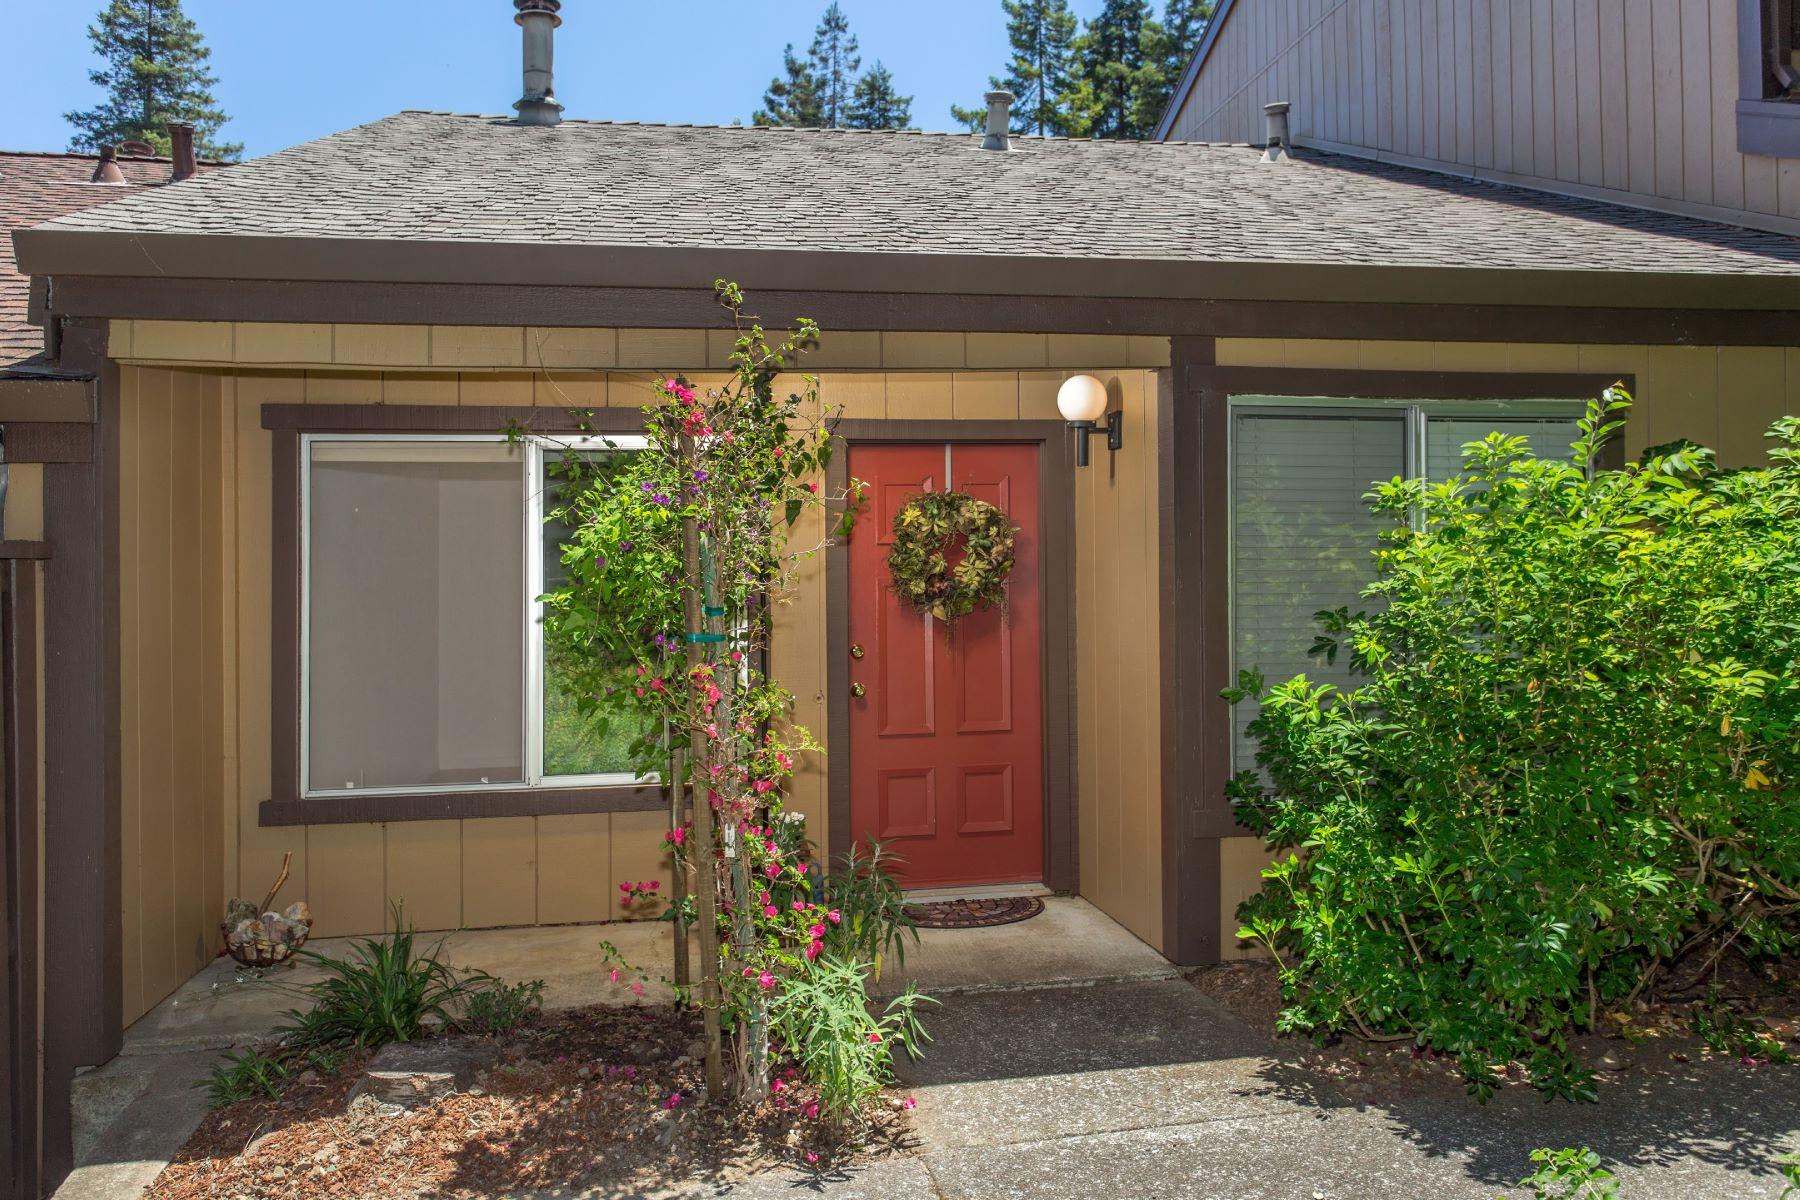 Condominium for Sale at Live in Wonderful Fairfax 7 Charro Way Fairfax, California 94930 United States